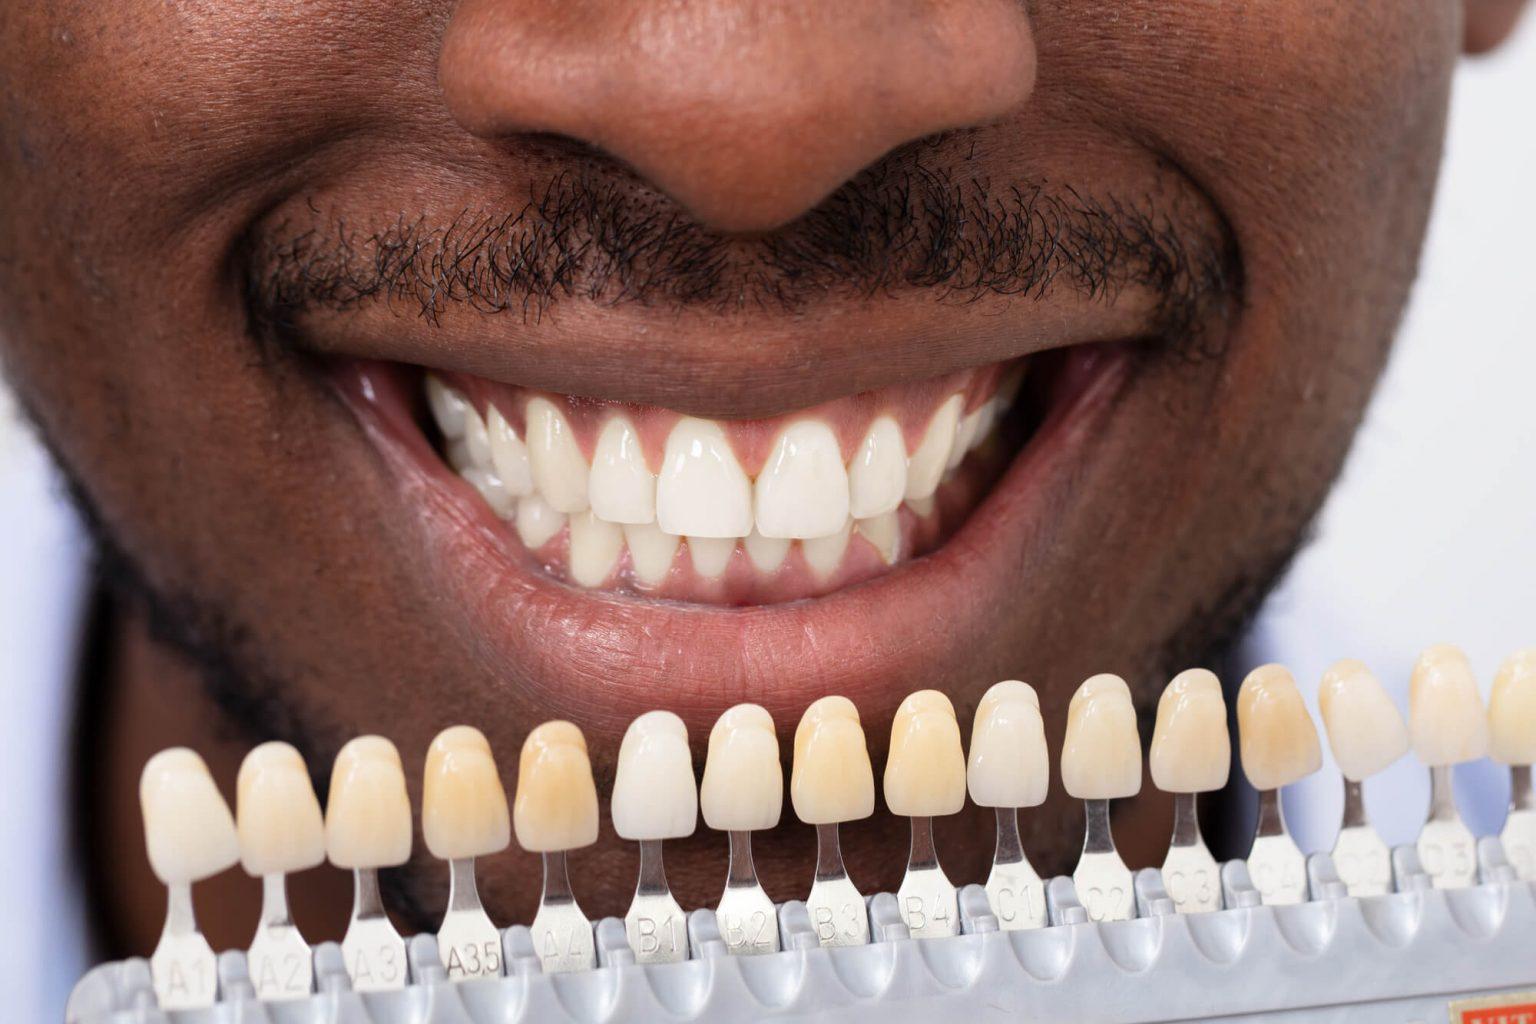 Where can I get Dental Implants Oak Park?